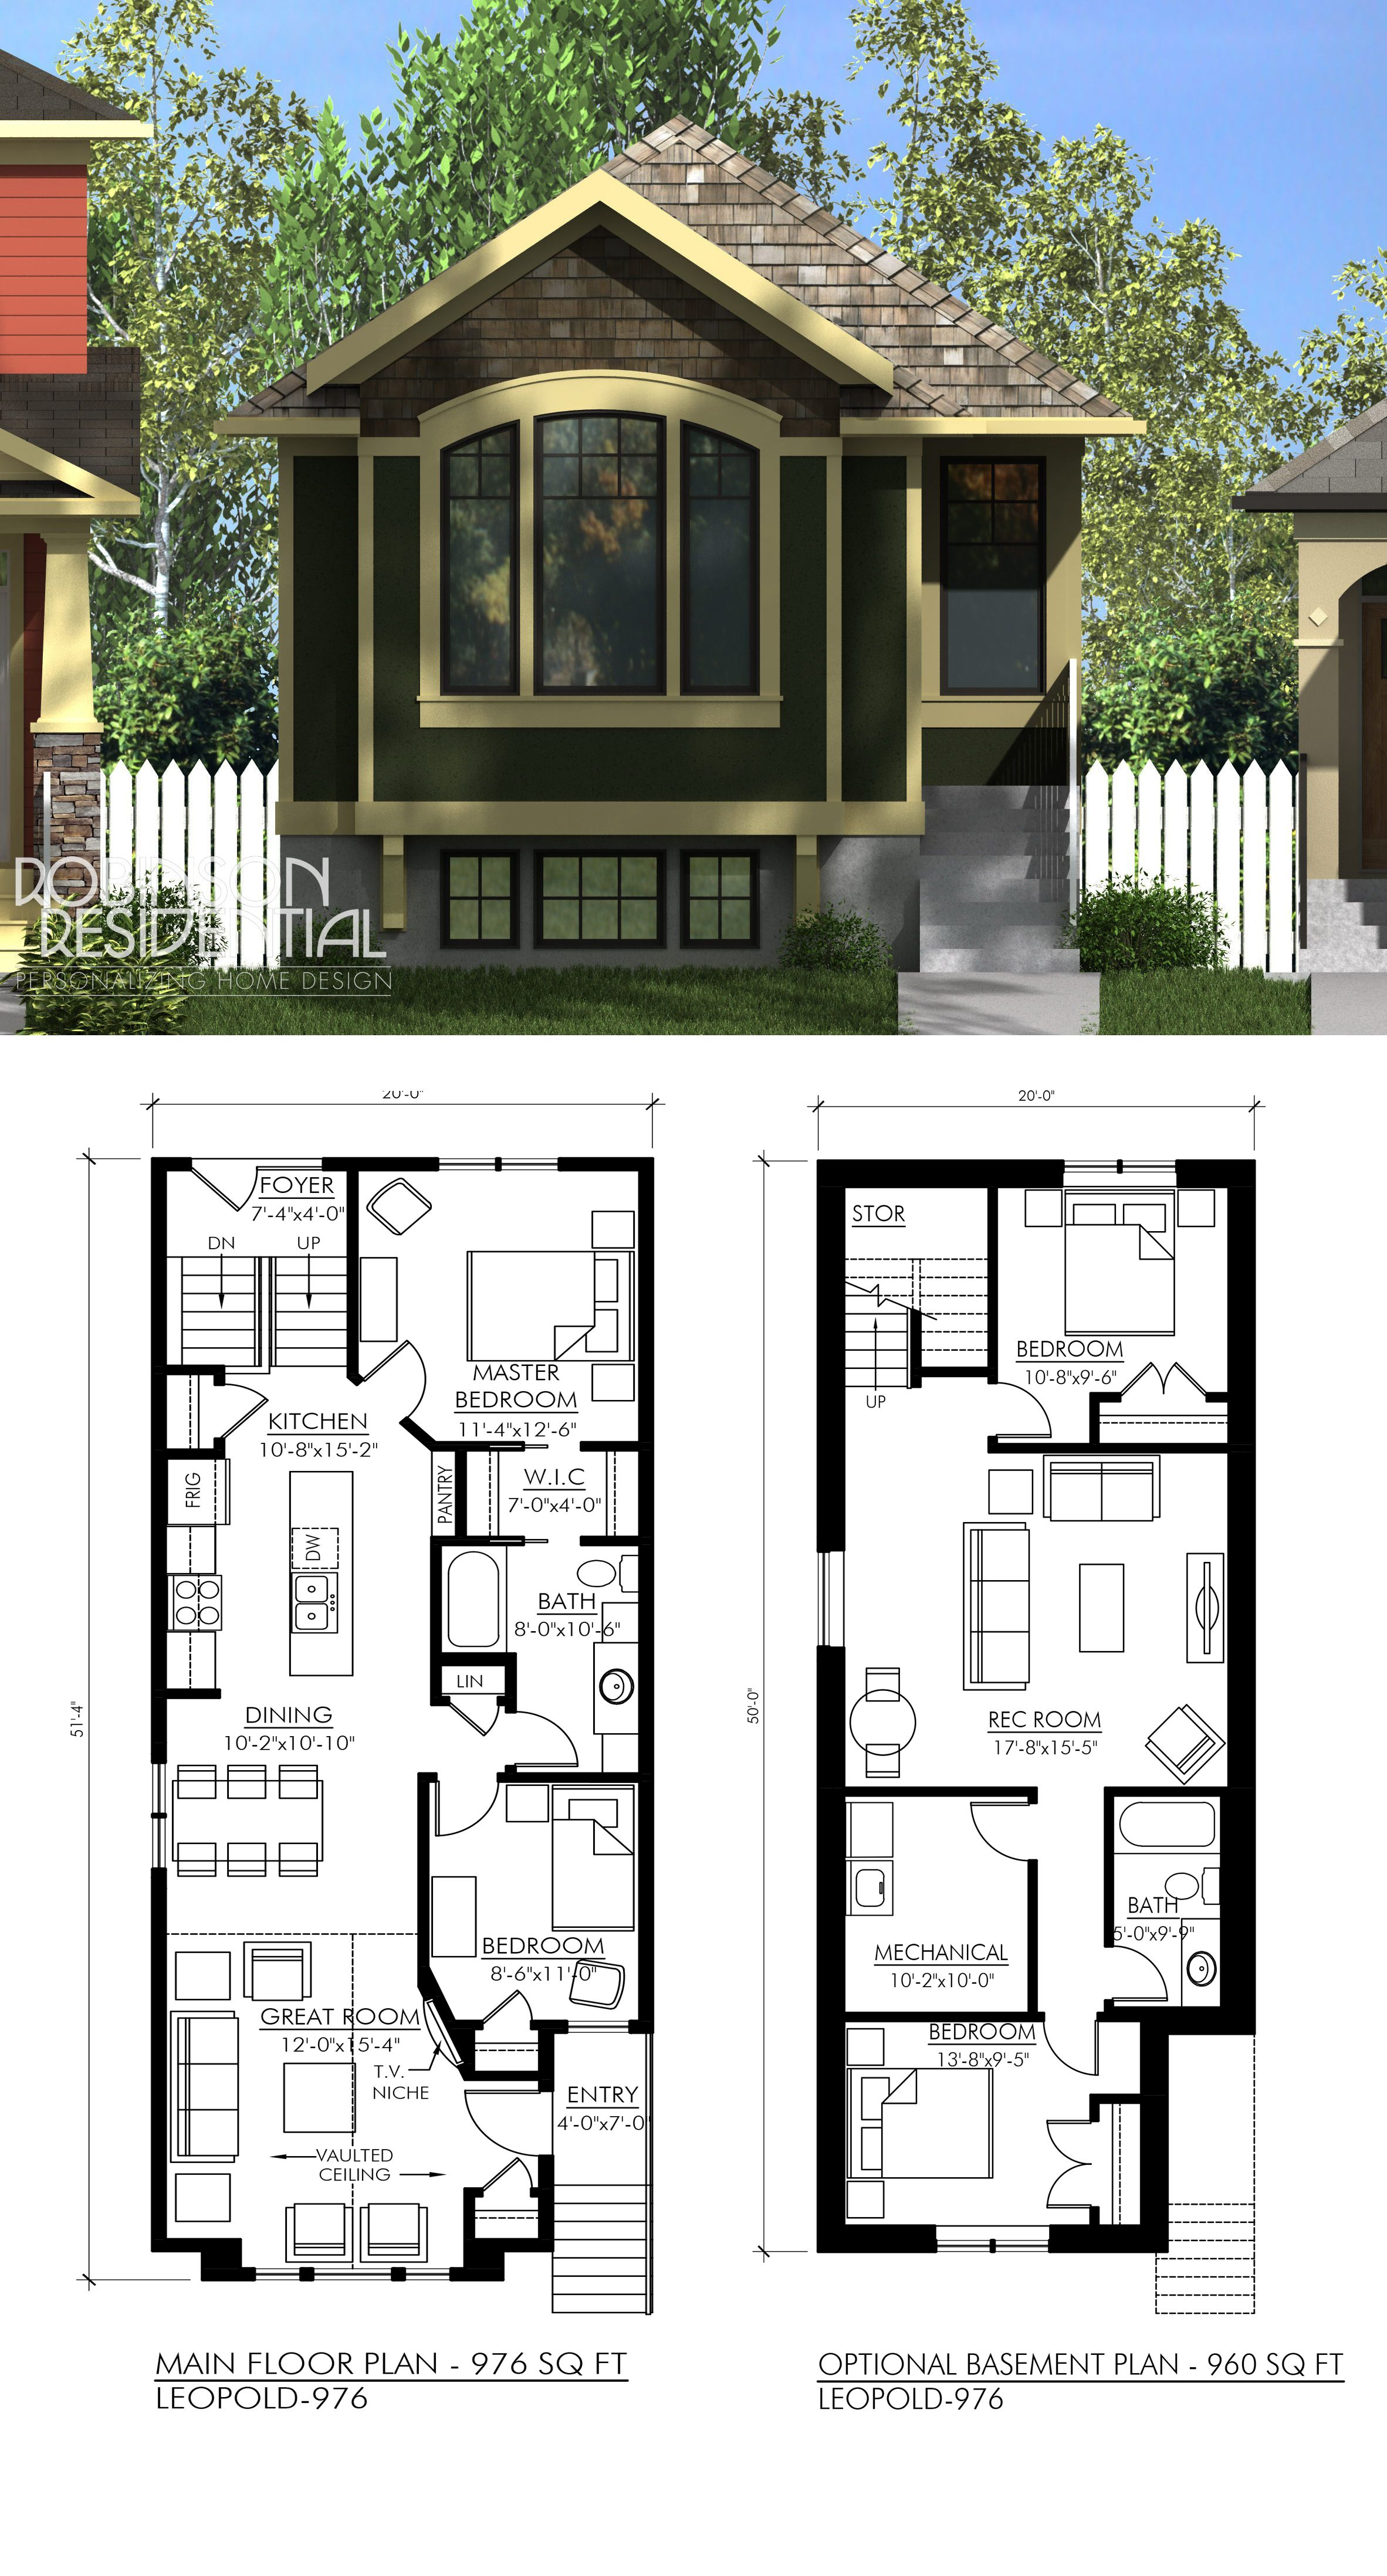 Craftsman House Design Features: Craftsman Leopold-976 In 2019